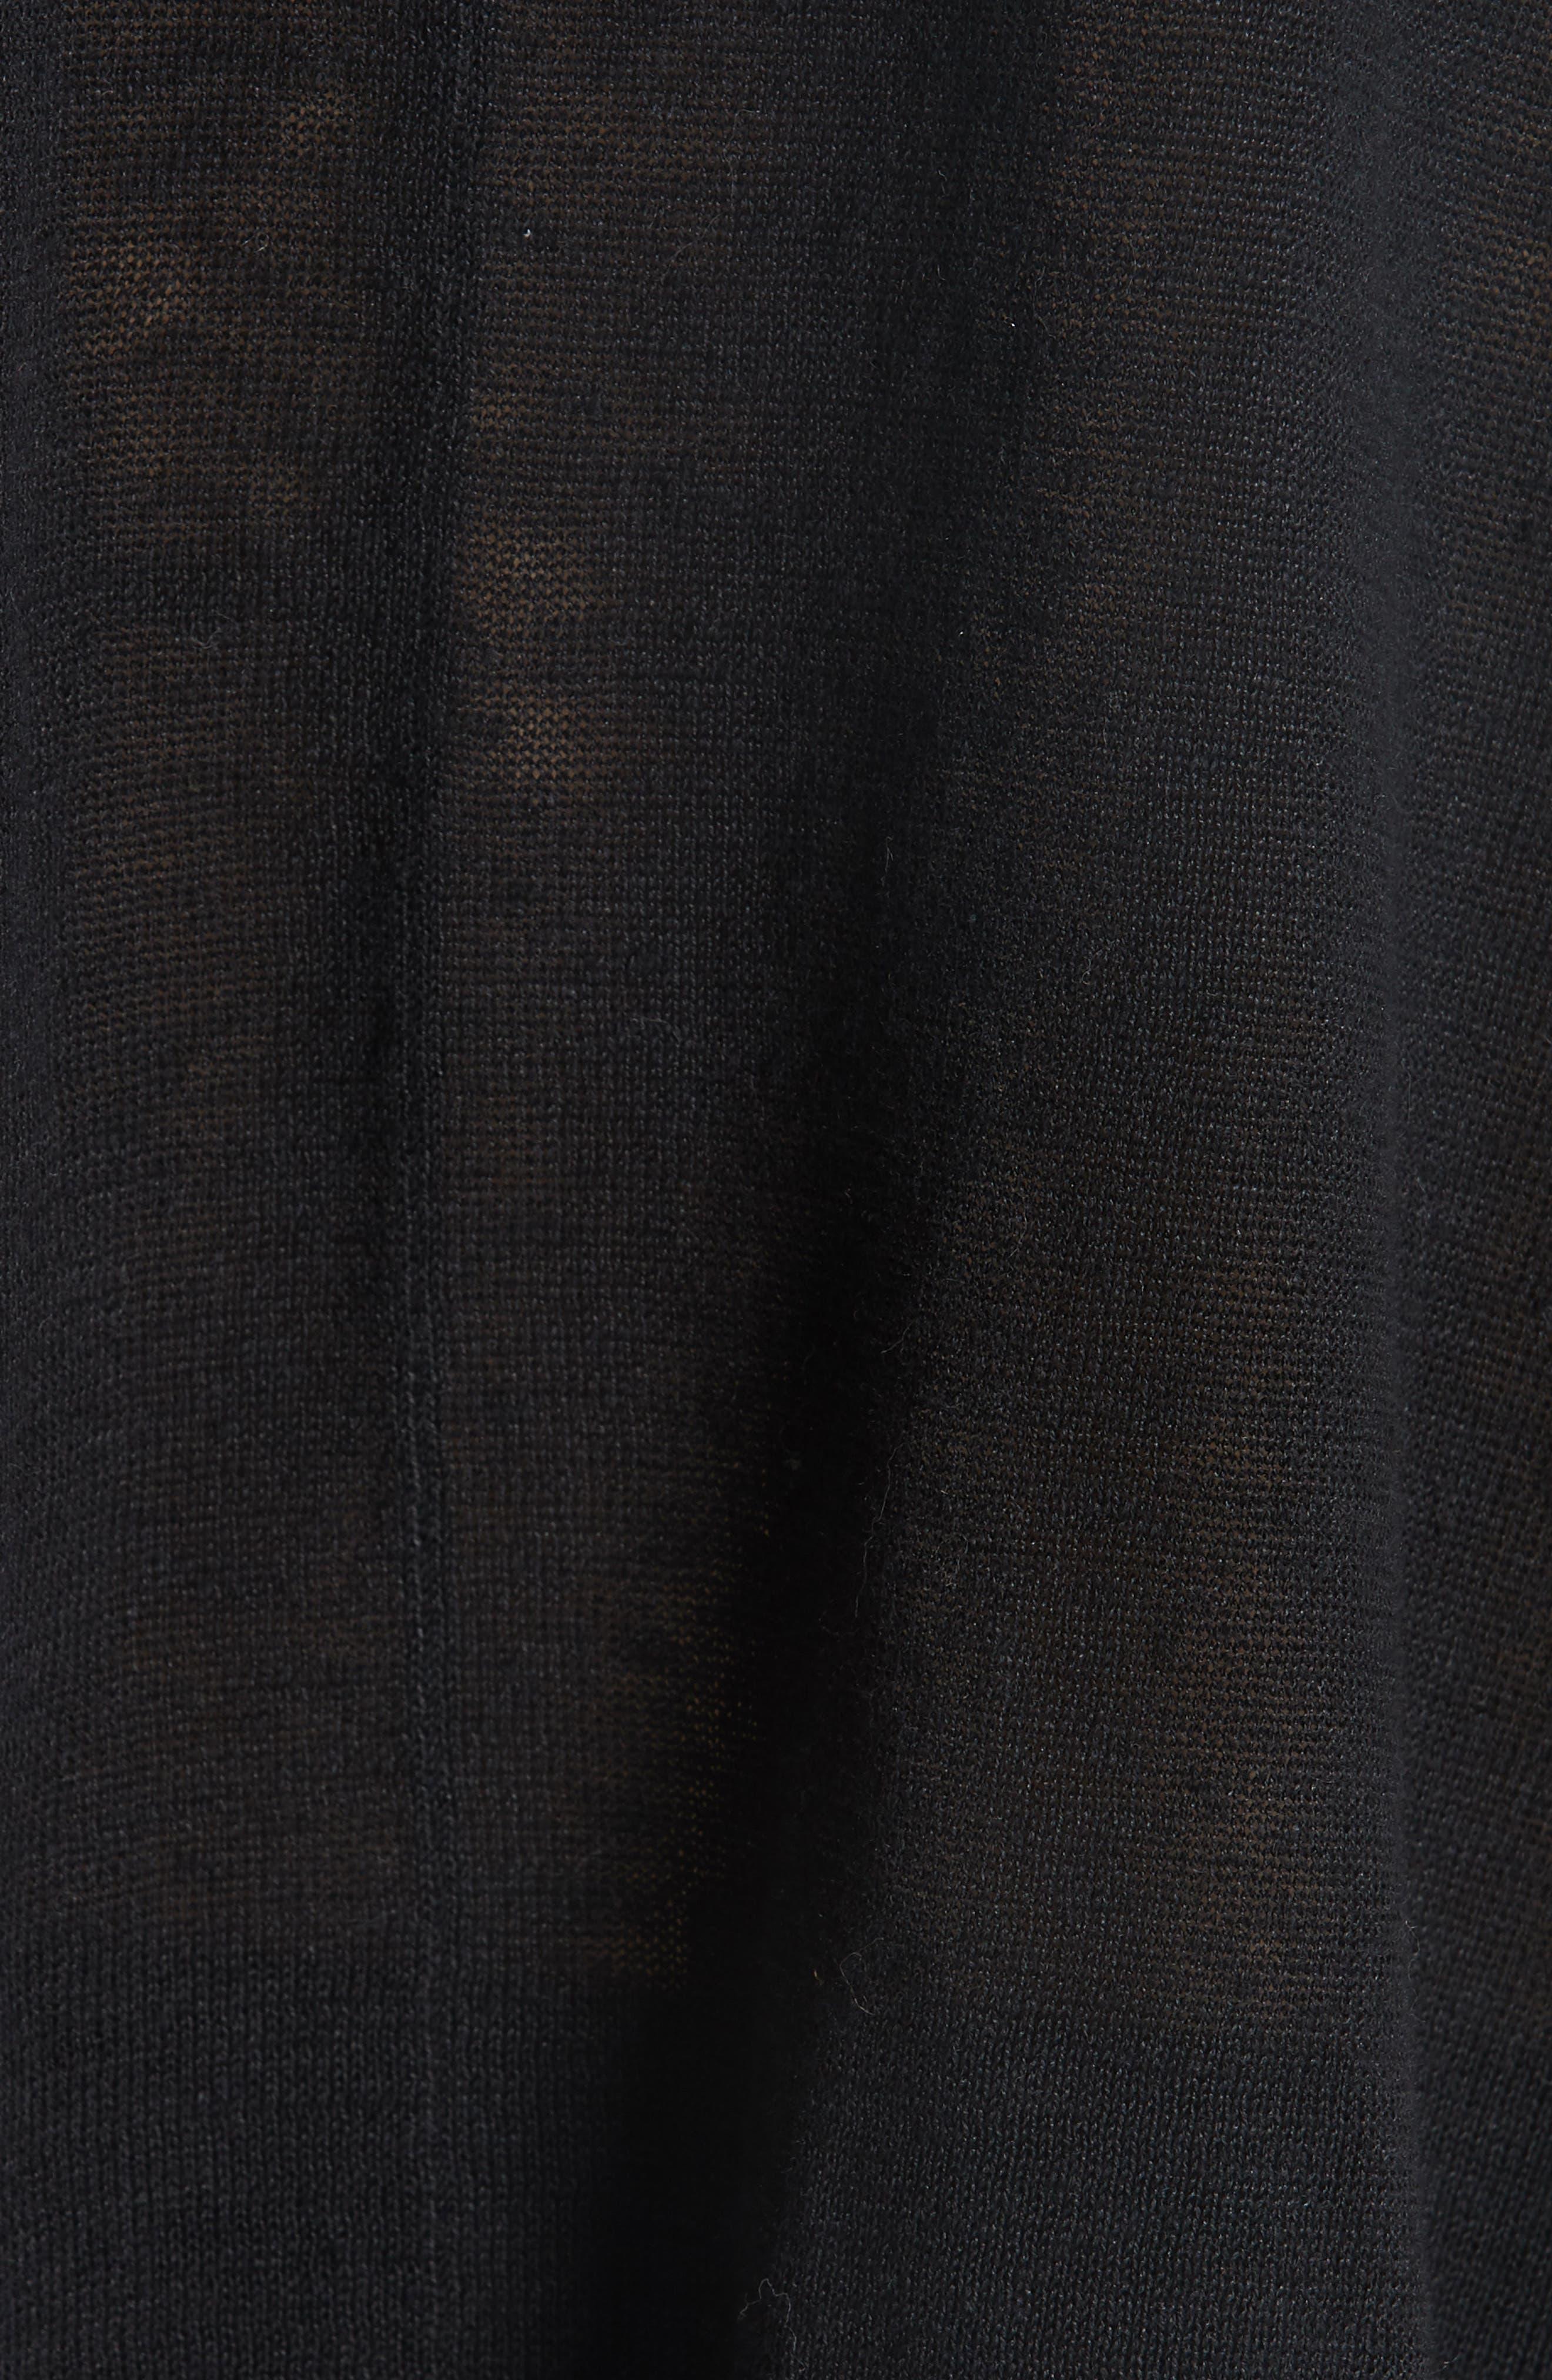 Boxy Organic Linen Sweater,                             Alternate thumbnail 5, color,                             BLACK